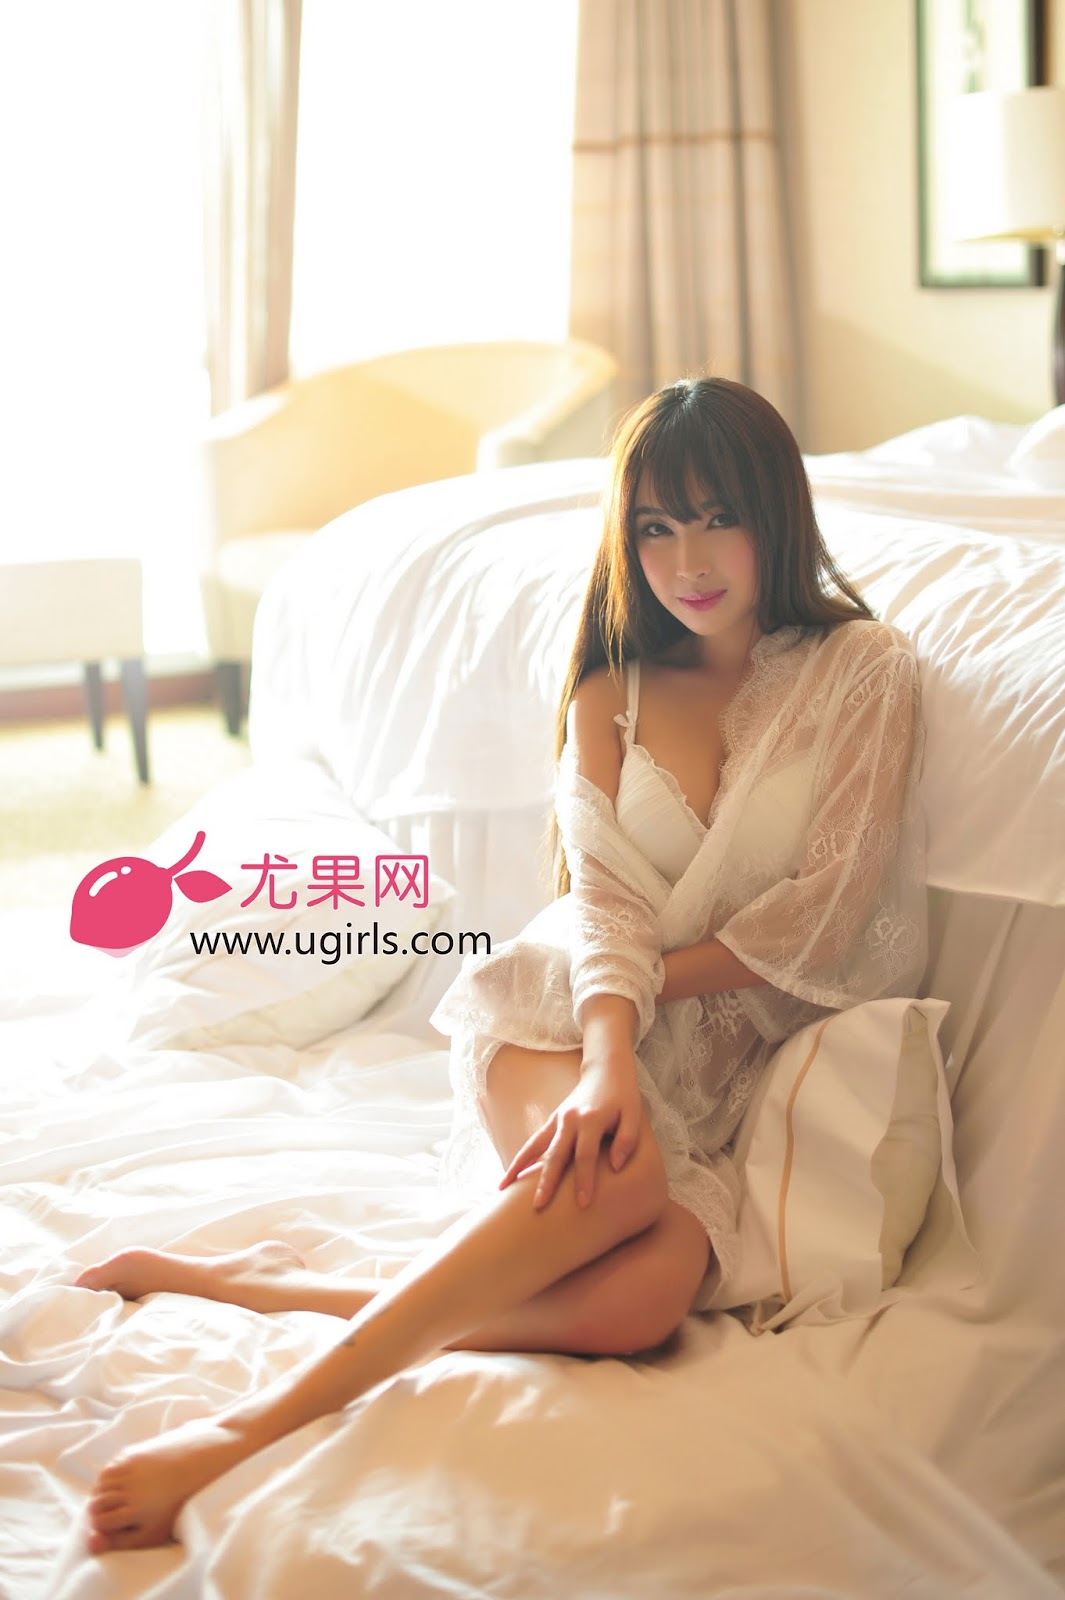 DLS 4566 - Hot Girl Model UGIRLS NO.13